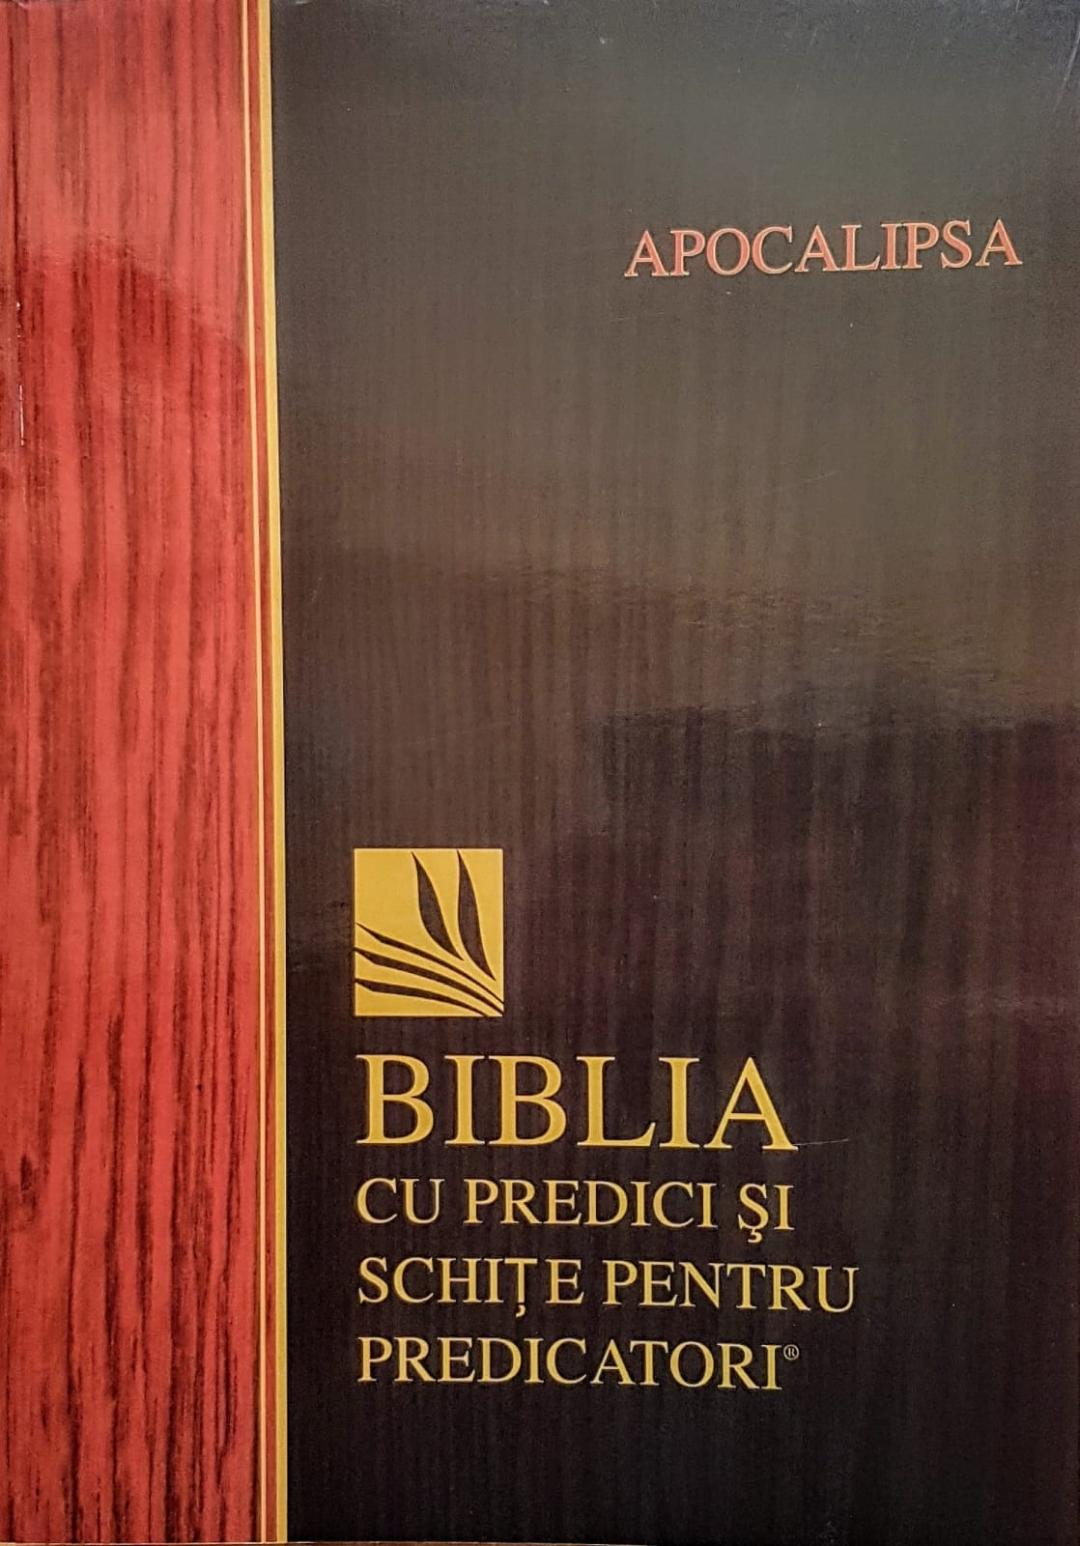 Conferință la Sânnicolau Mare